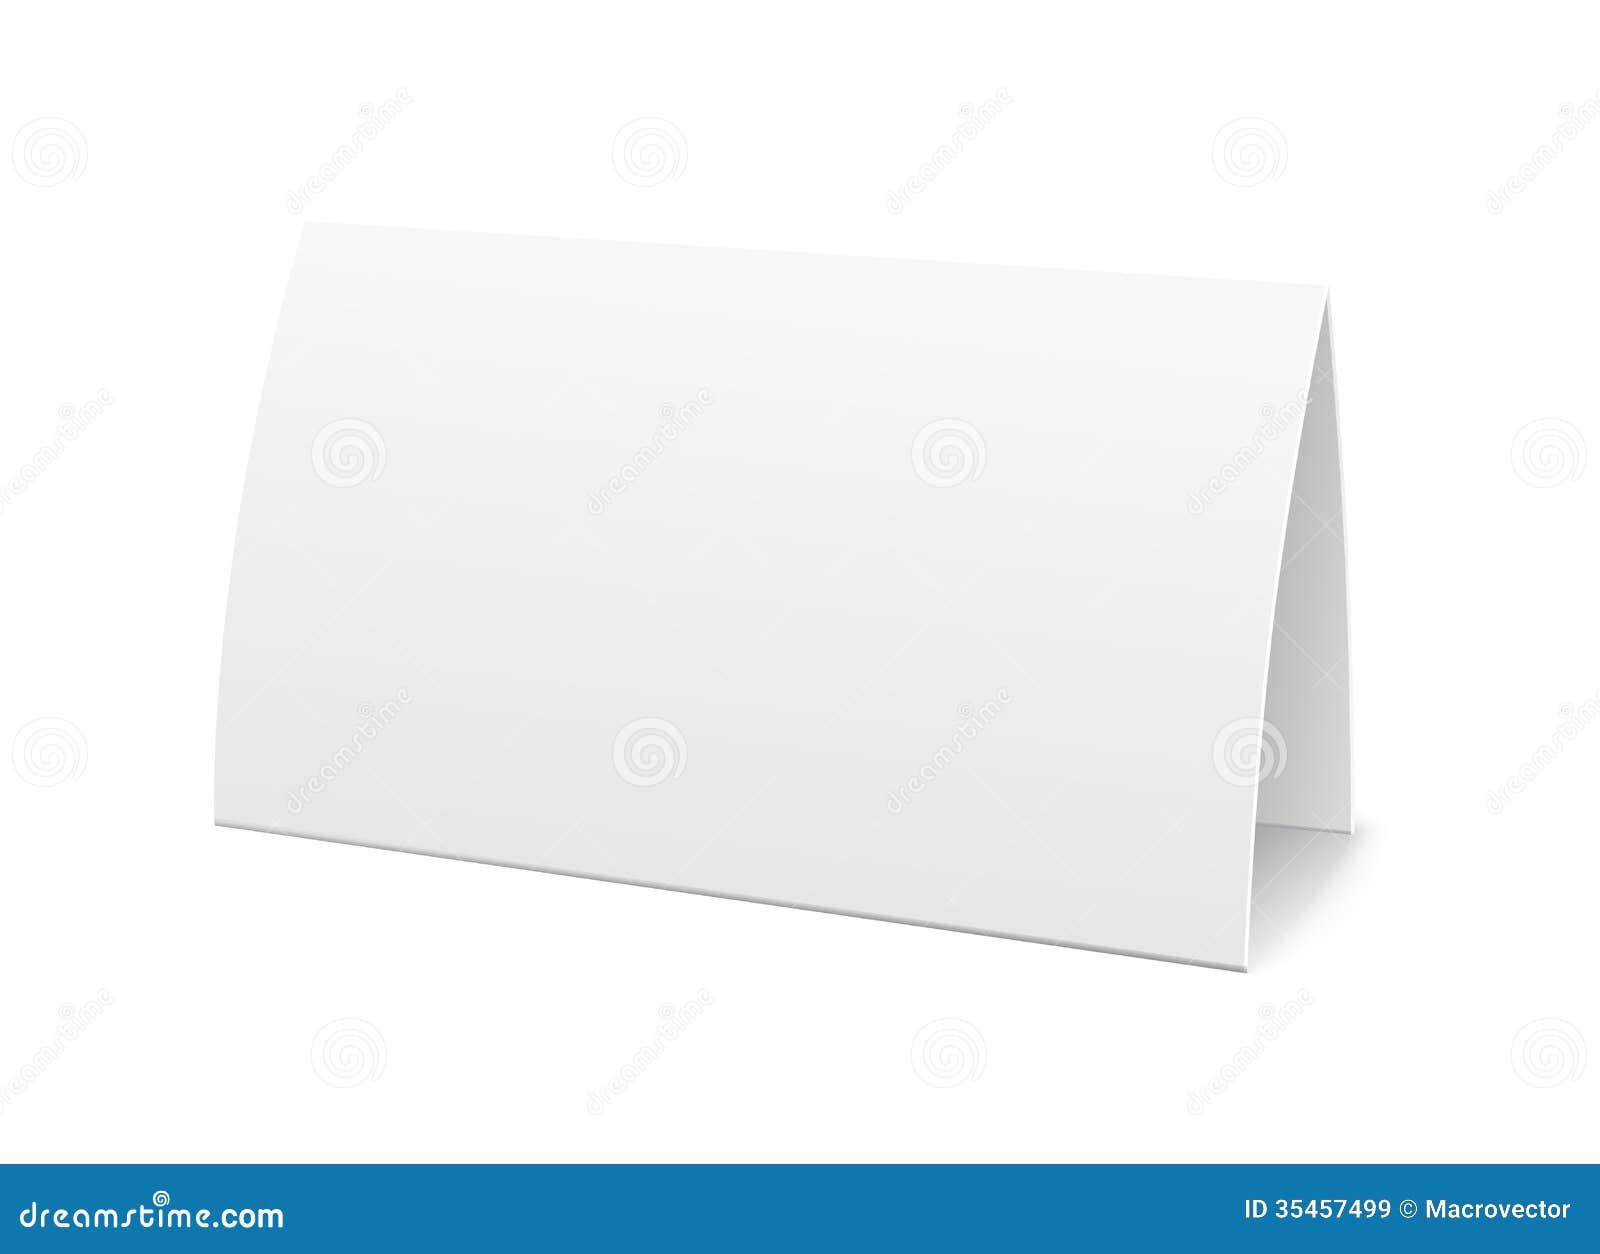 folding business card template - Fieldstation.co